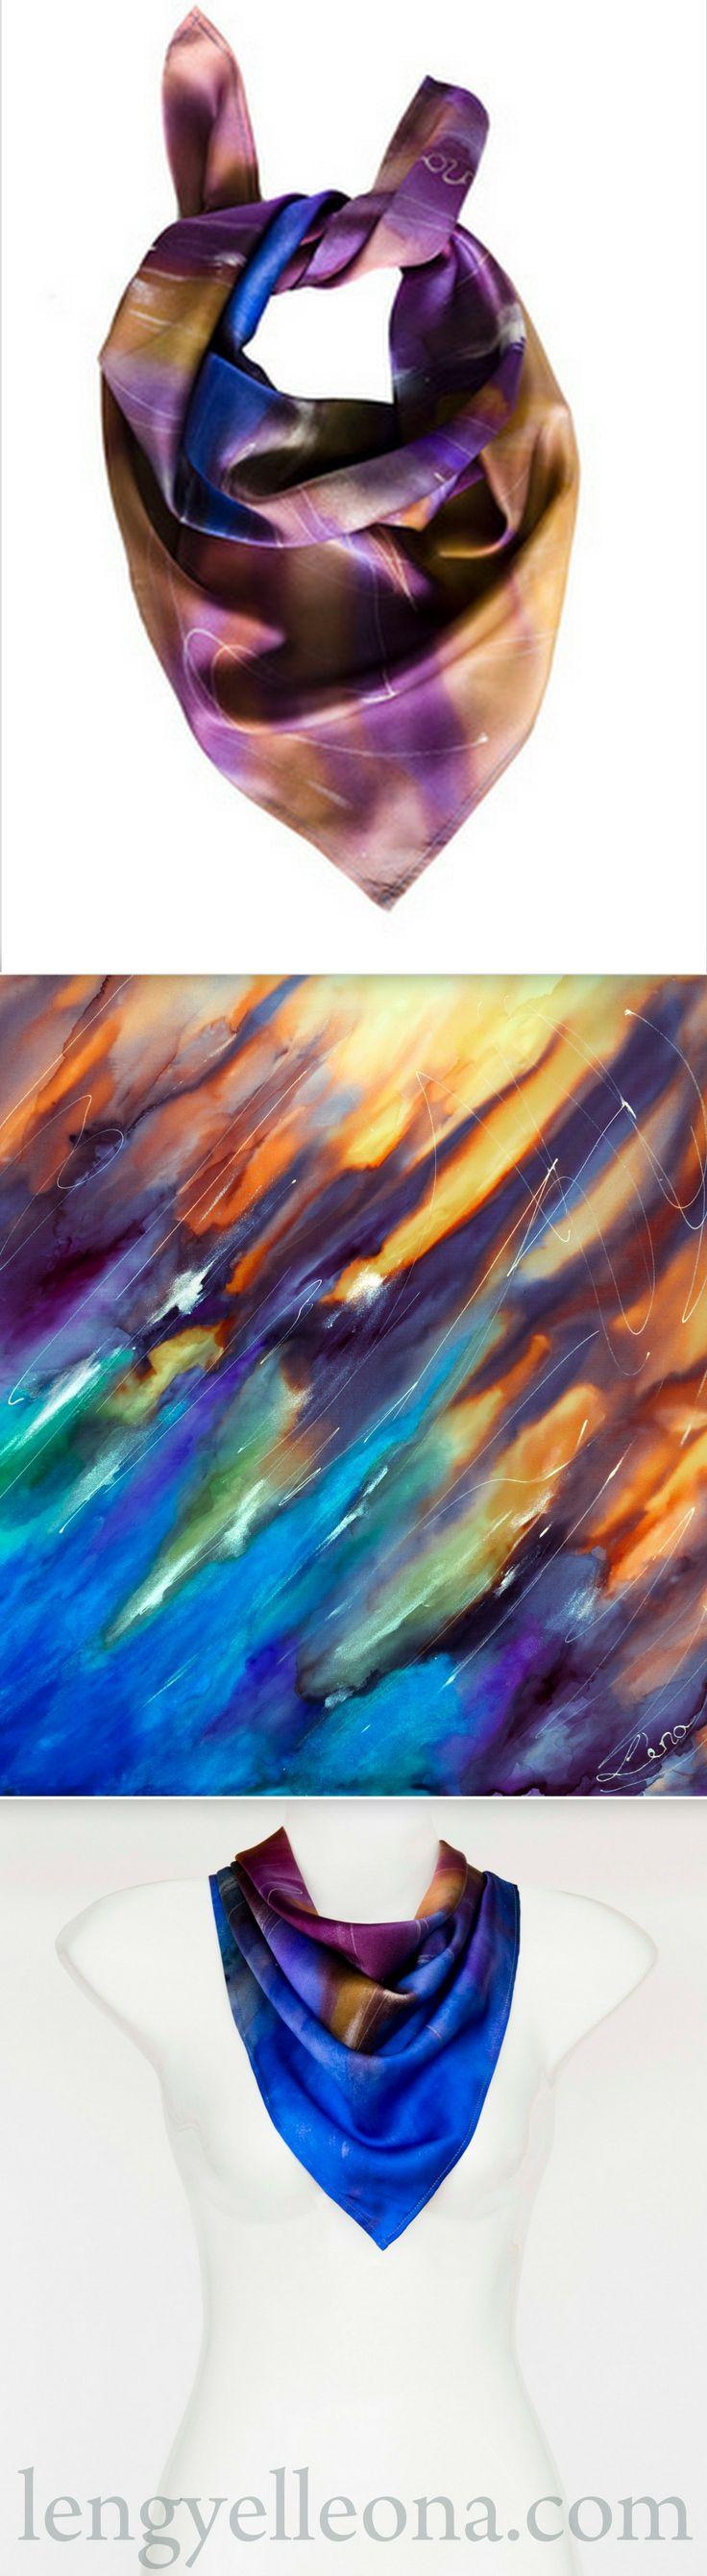 LENGYEL LEONA ONLINE SHOP http://www.lengyelleona.com/purple-rain-neckerchief…